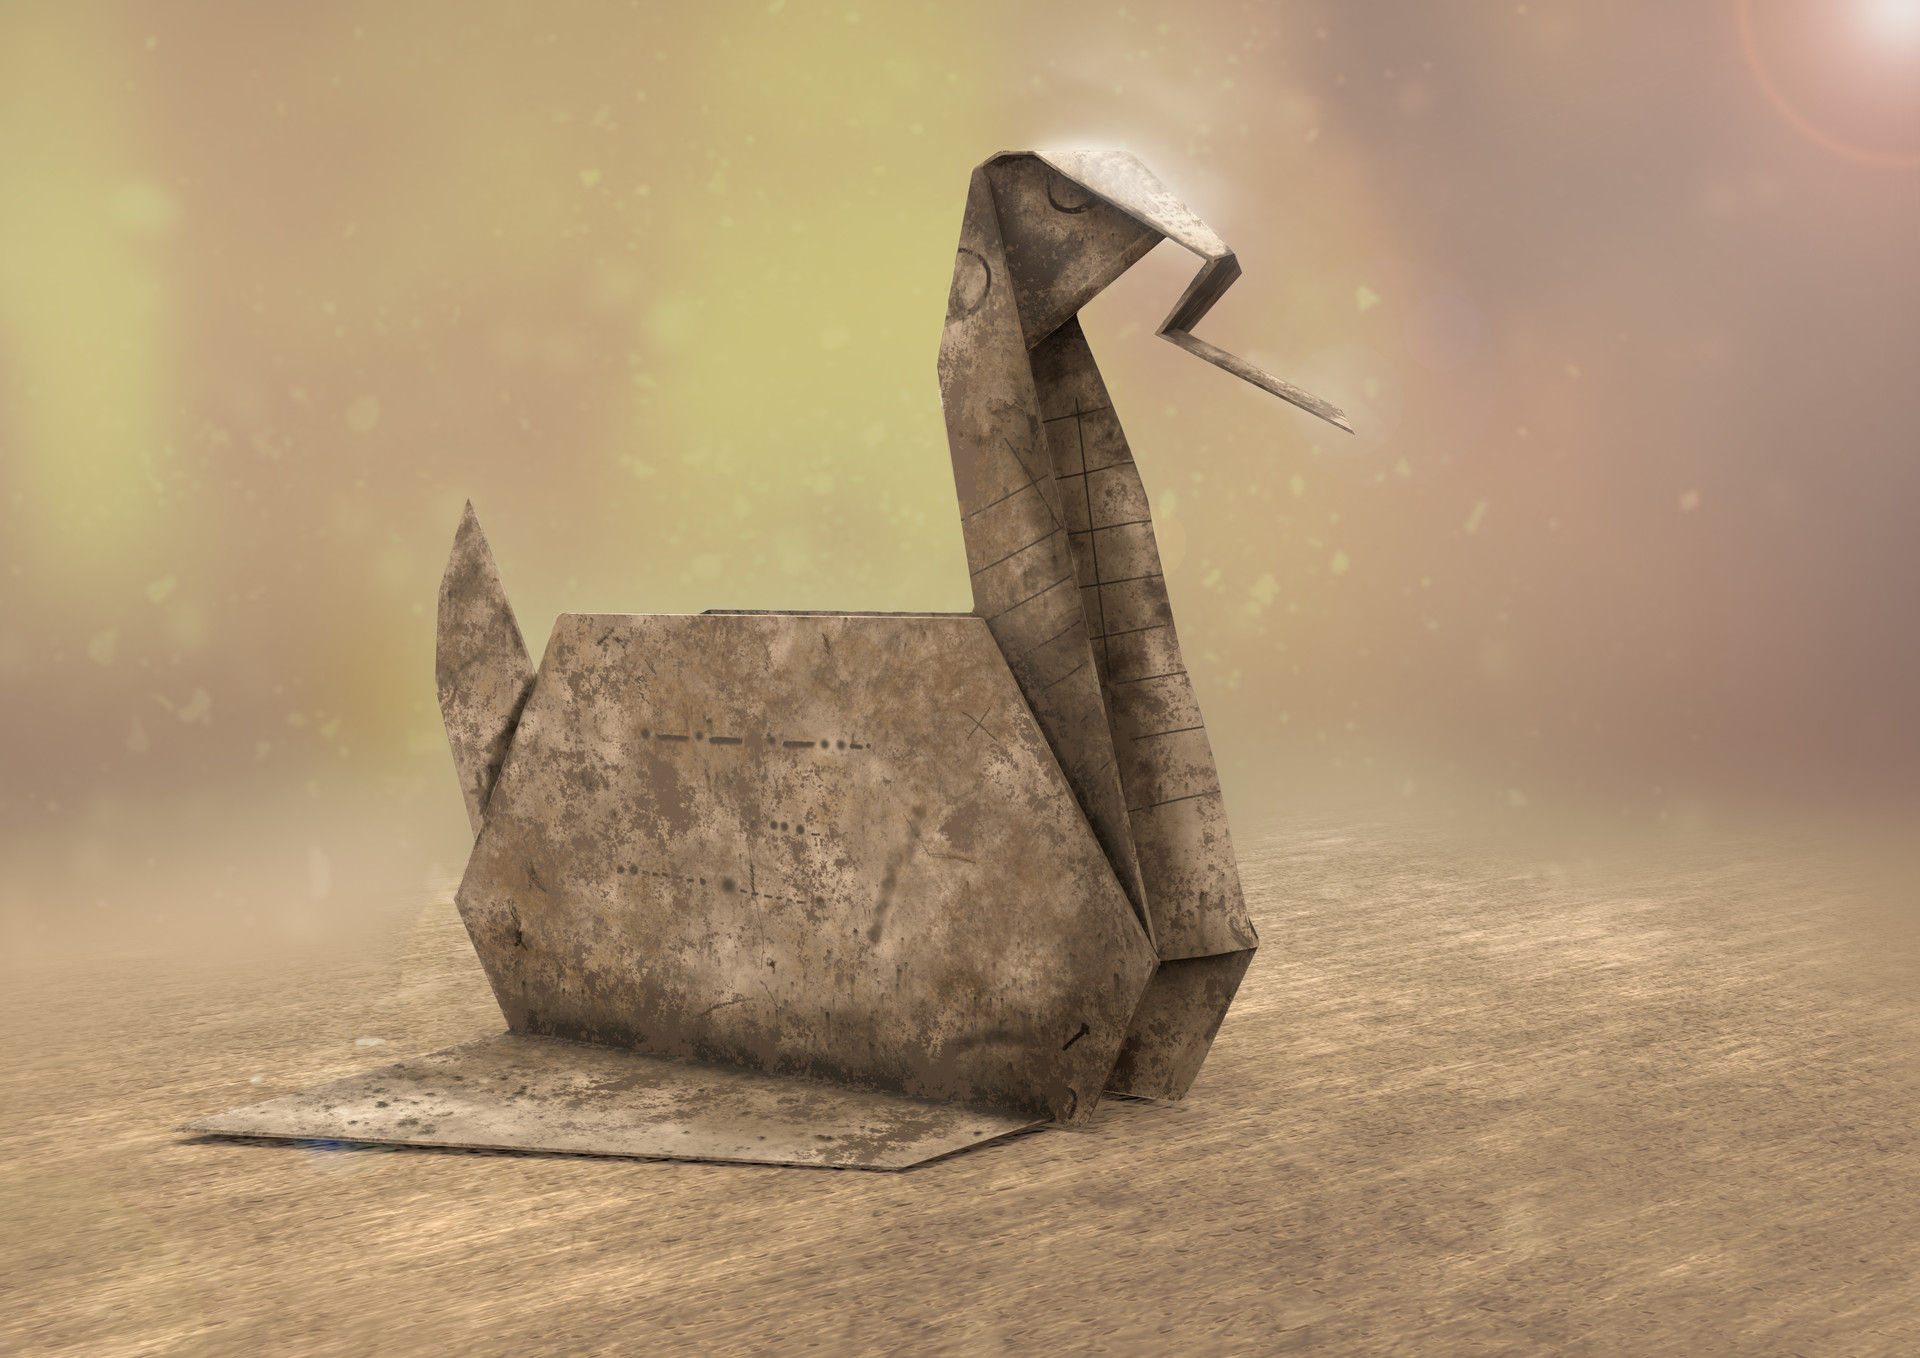 ruddy buch prisonbreak origami